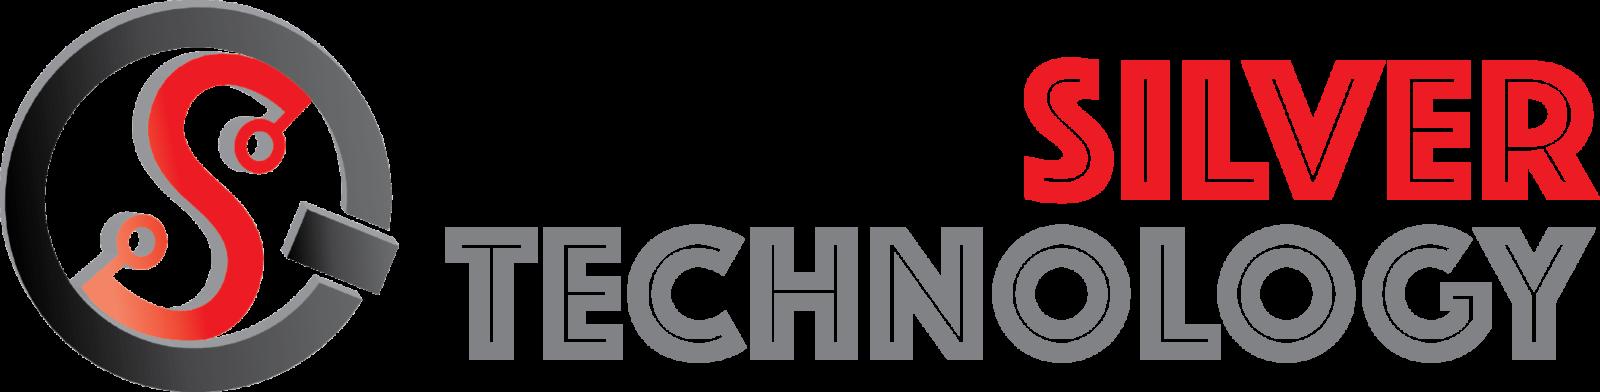 Quicksilver Technology